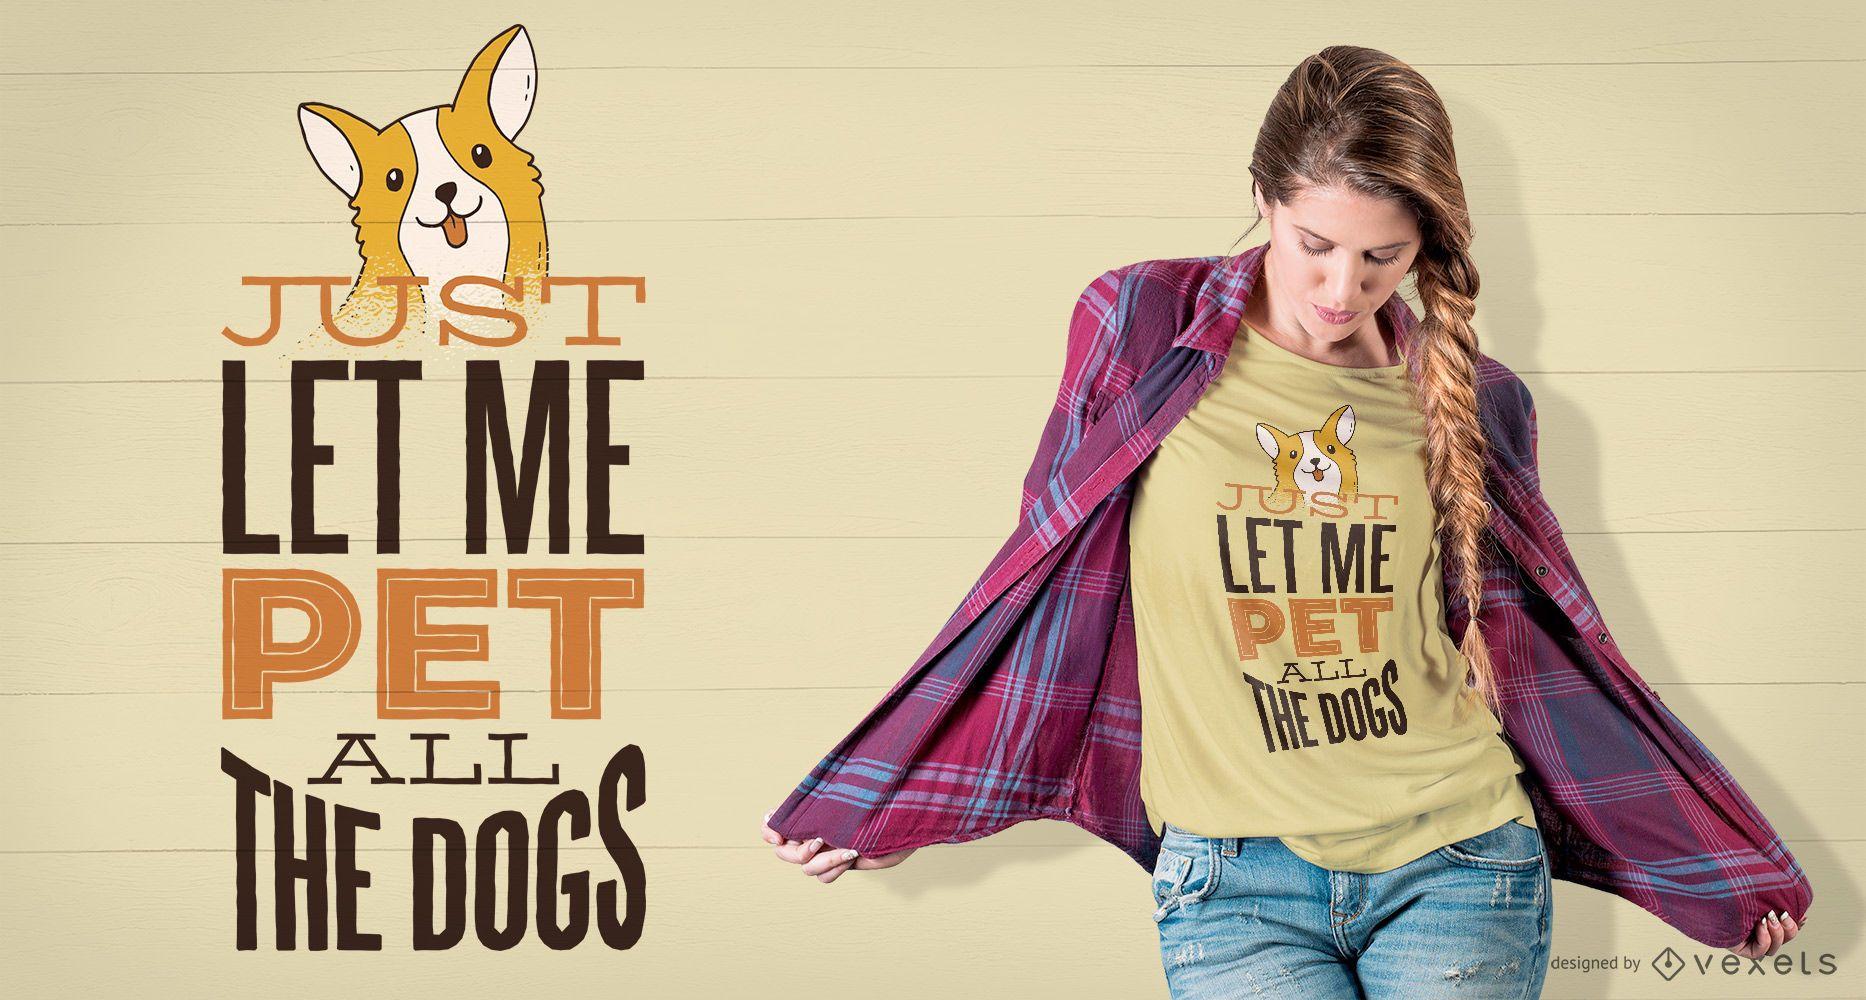 Dise?o de camiseta Pet All the Dogs